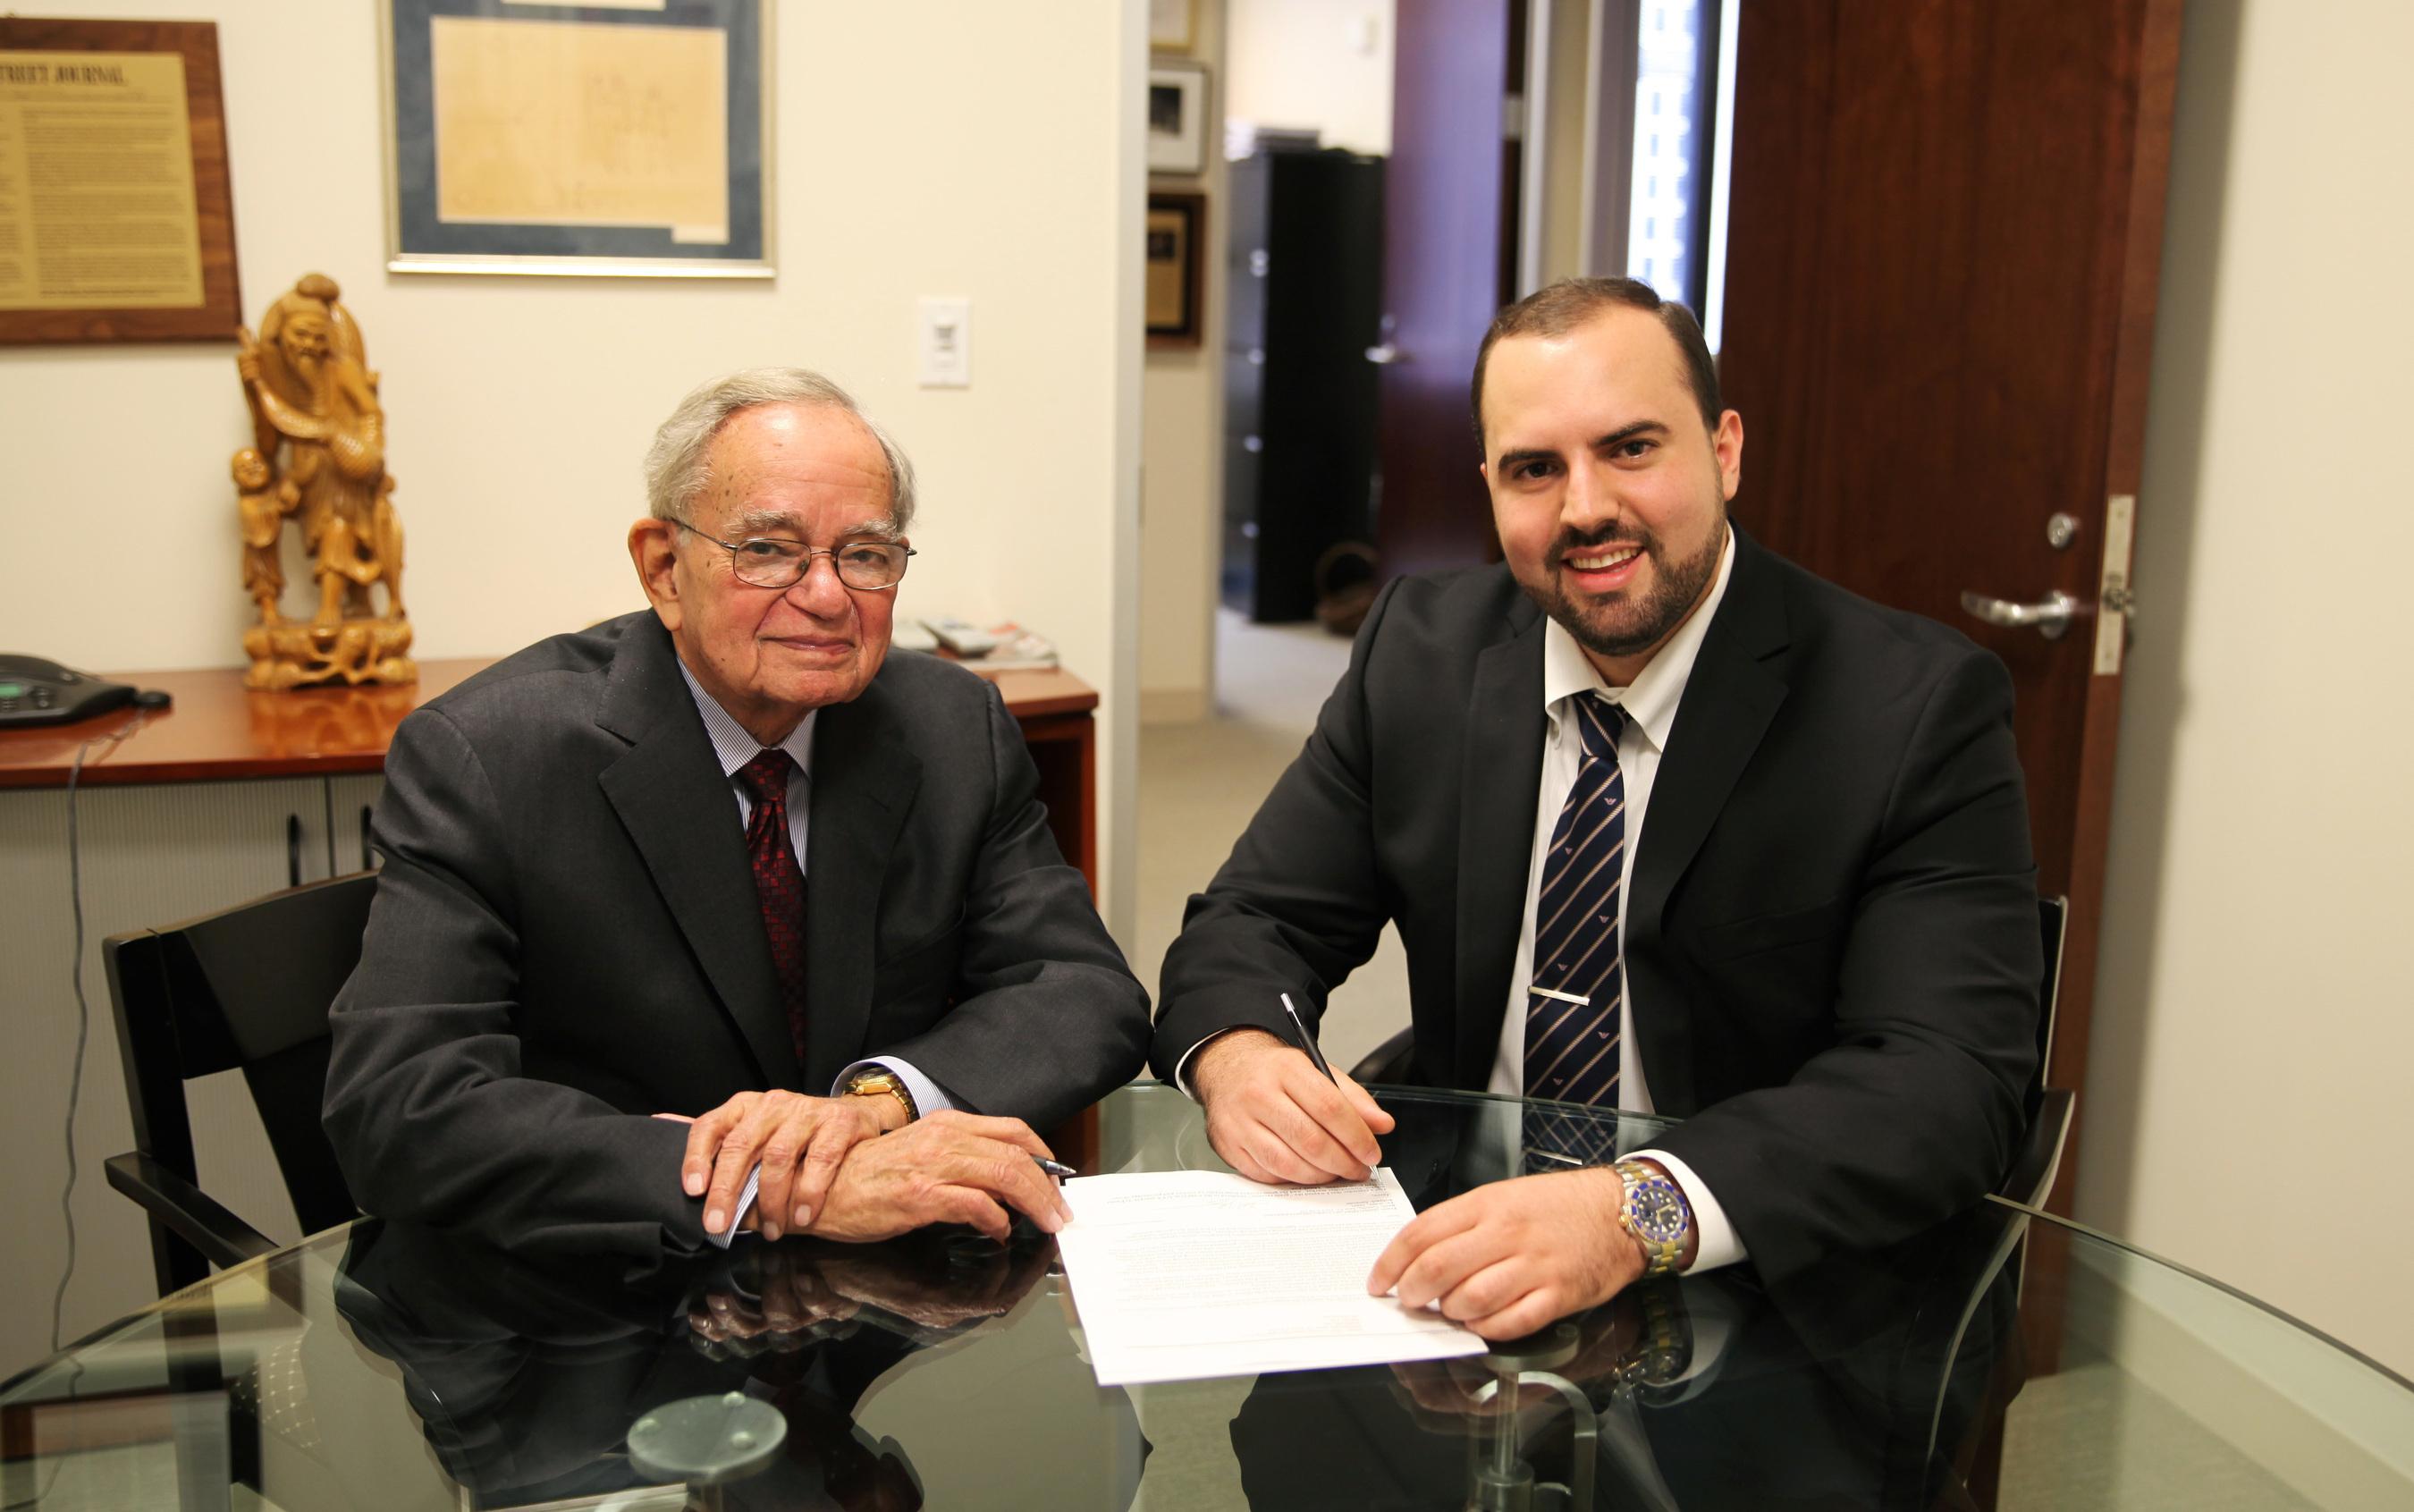 Leo Melamed and David Widerhorn signing the Strategic Alliance (PRNewsFoto/Melamed & Associates, Inc.)